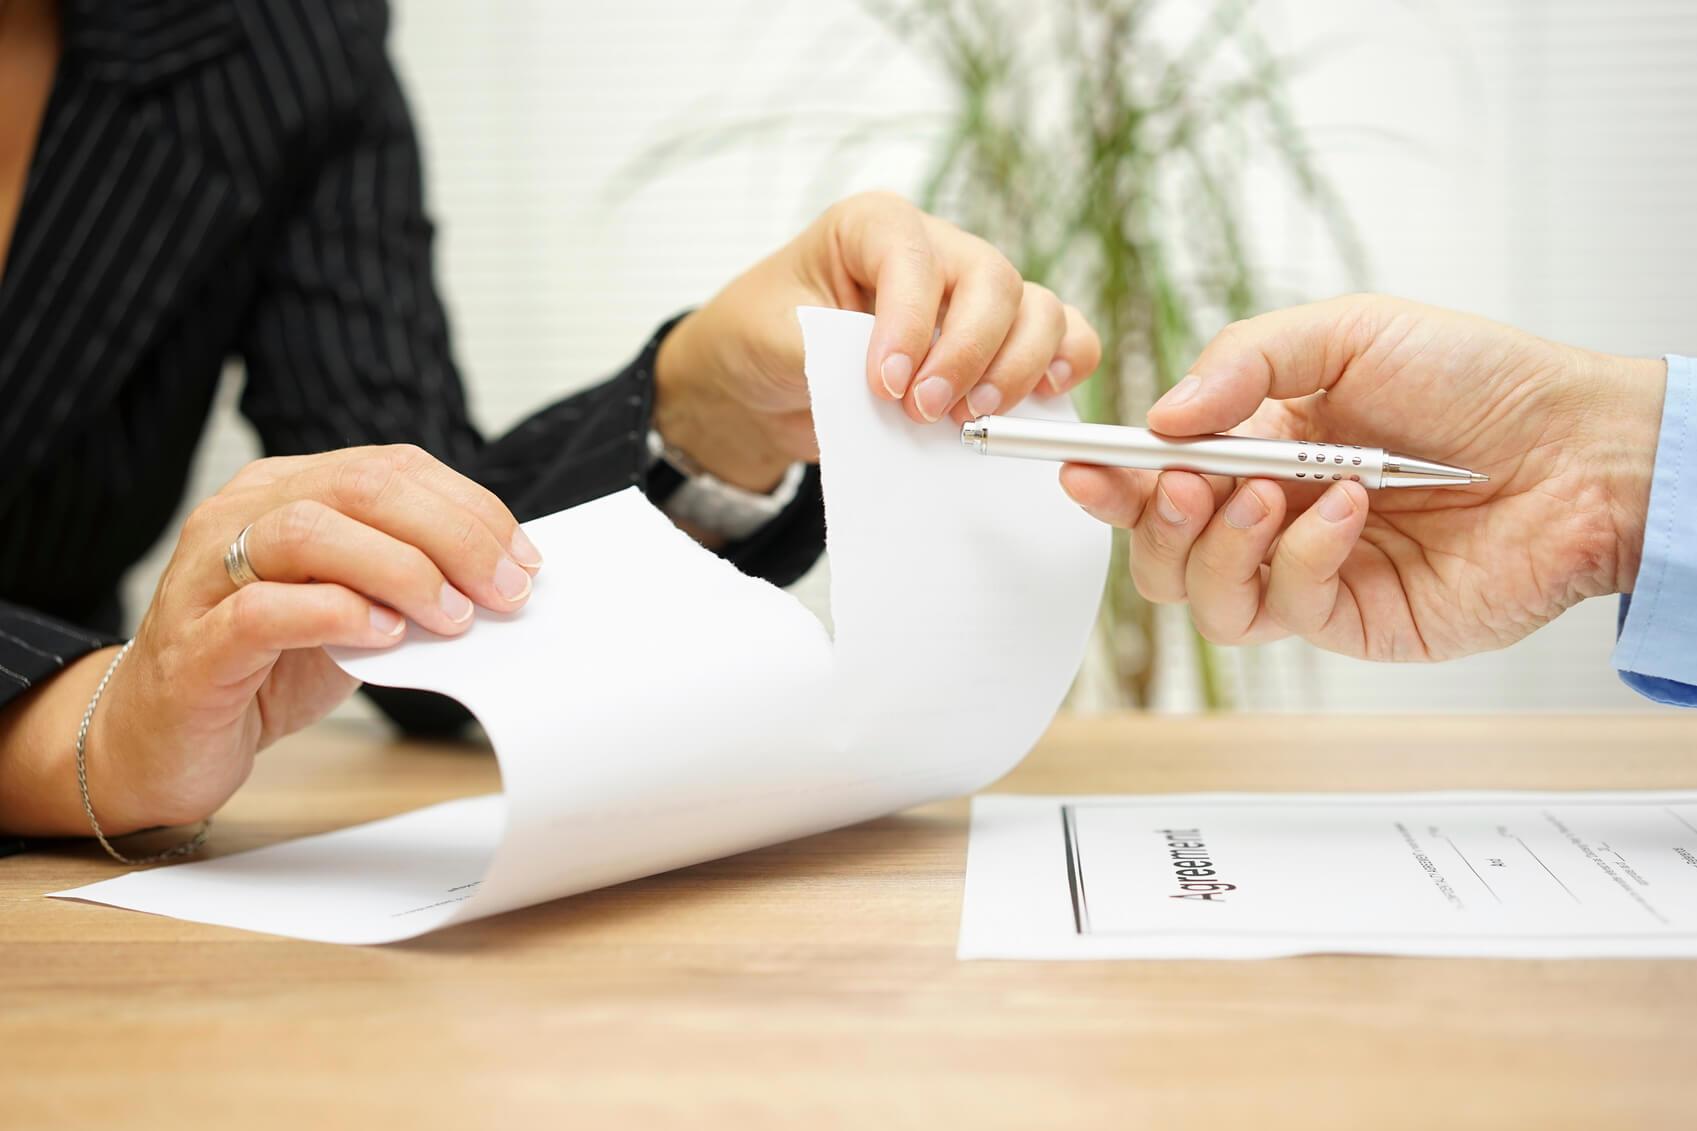 Partnervermittlung fernabsatzvertrag